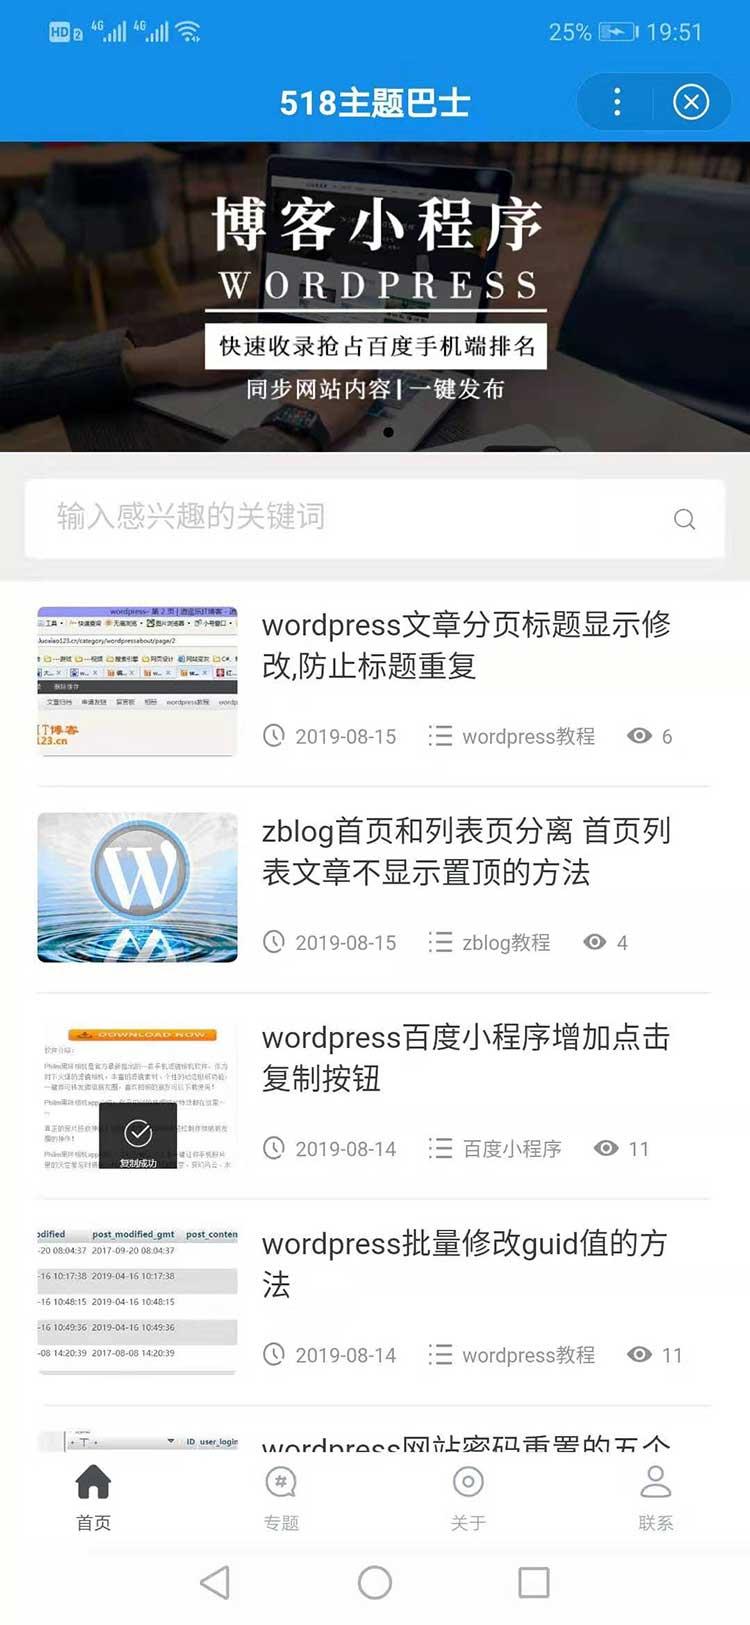 zblog小程序首页